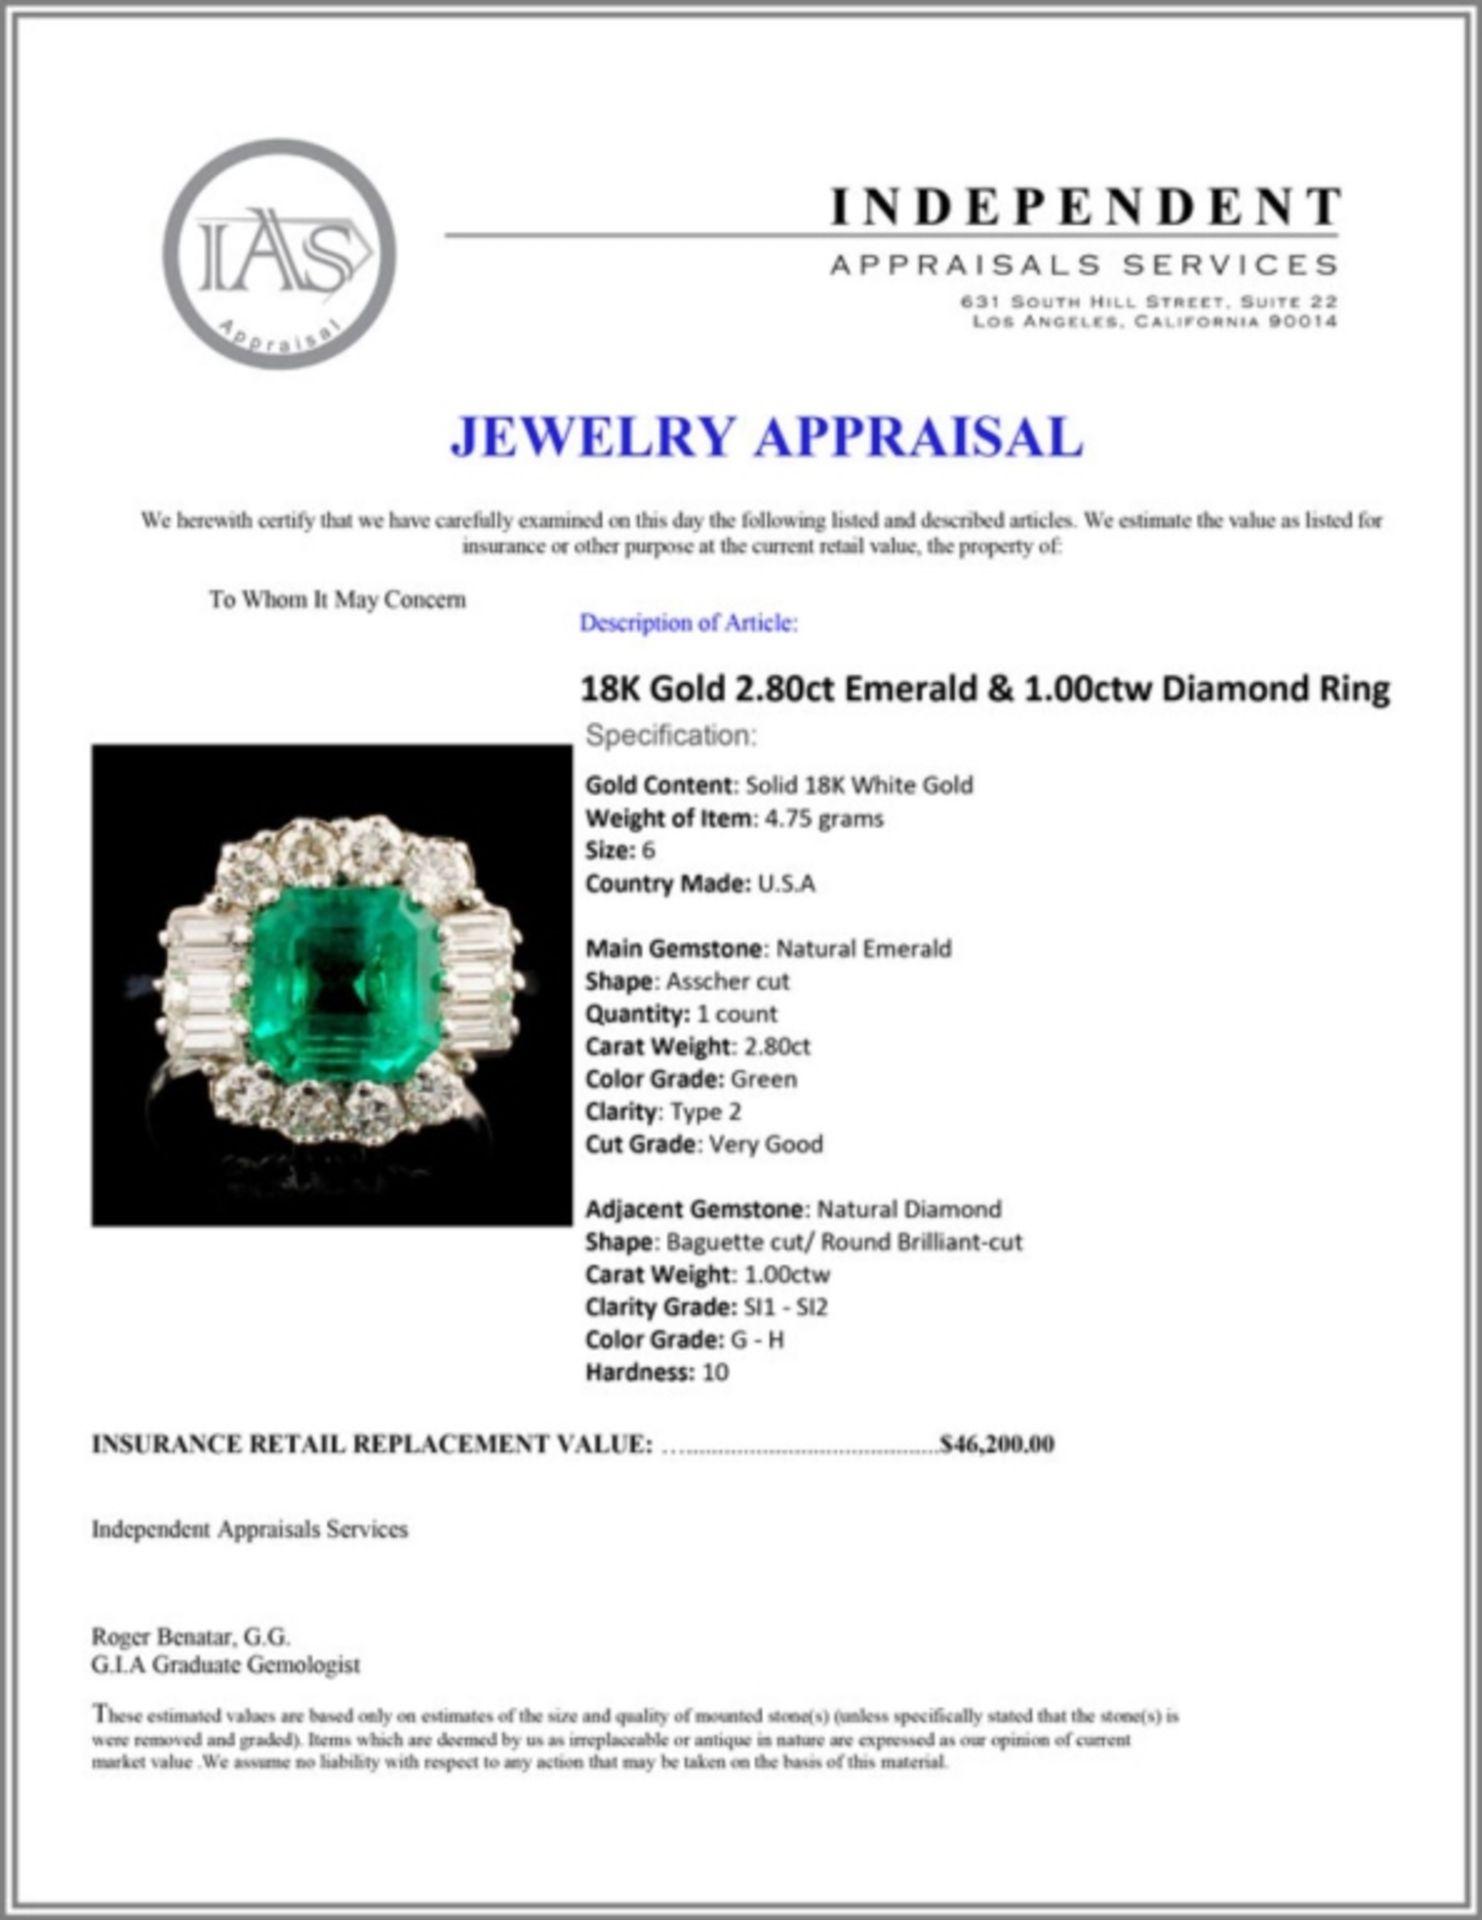 18K Gold 2.80ct Emerald & 1.00ctw Diamond Ring - Image 5 of 5